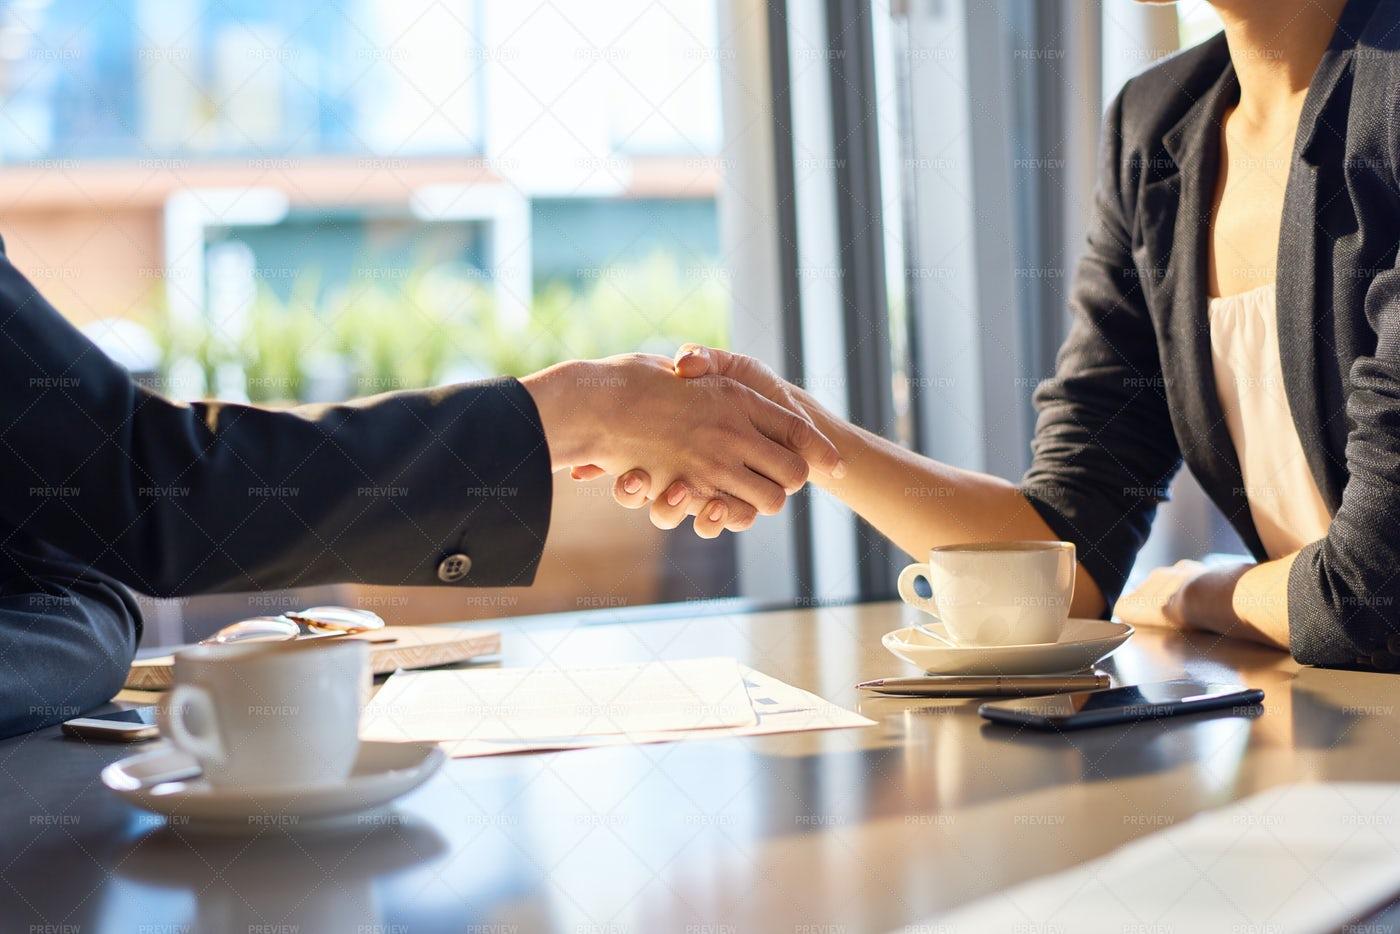 Firm Handshake Of Business Partners: Stock Photos